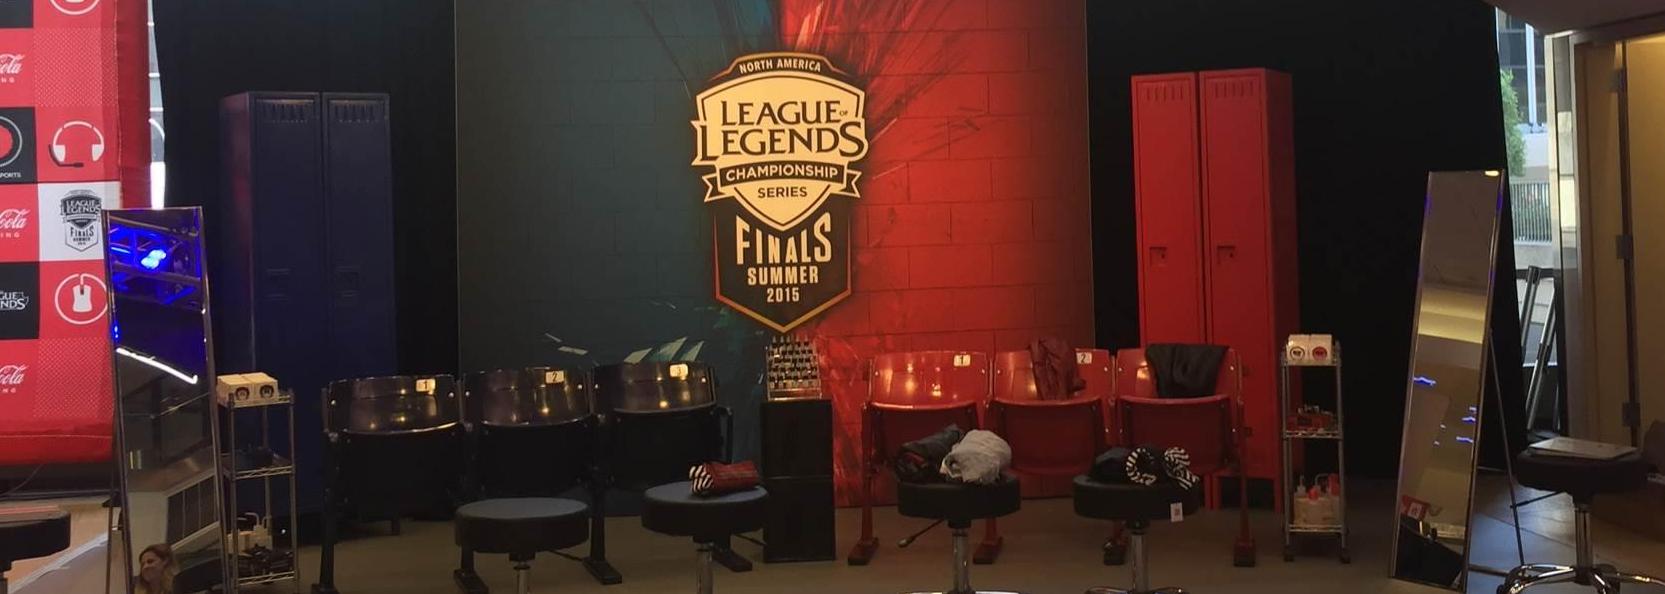 leagueoflegendsseats